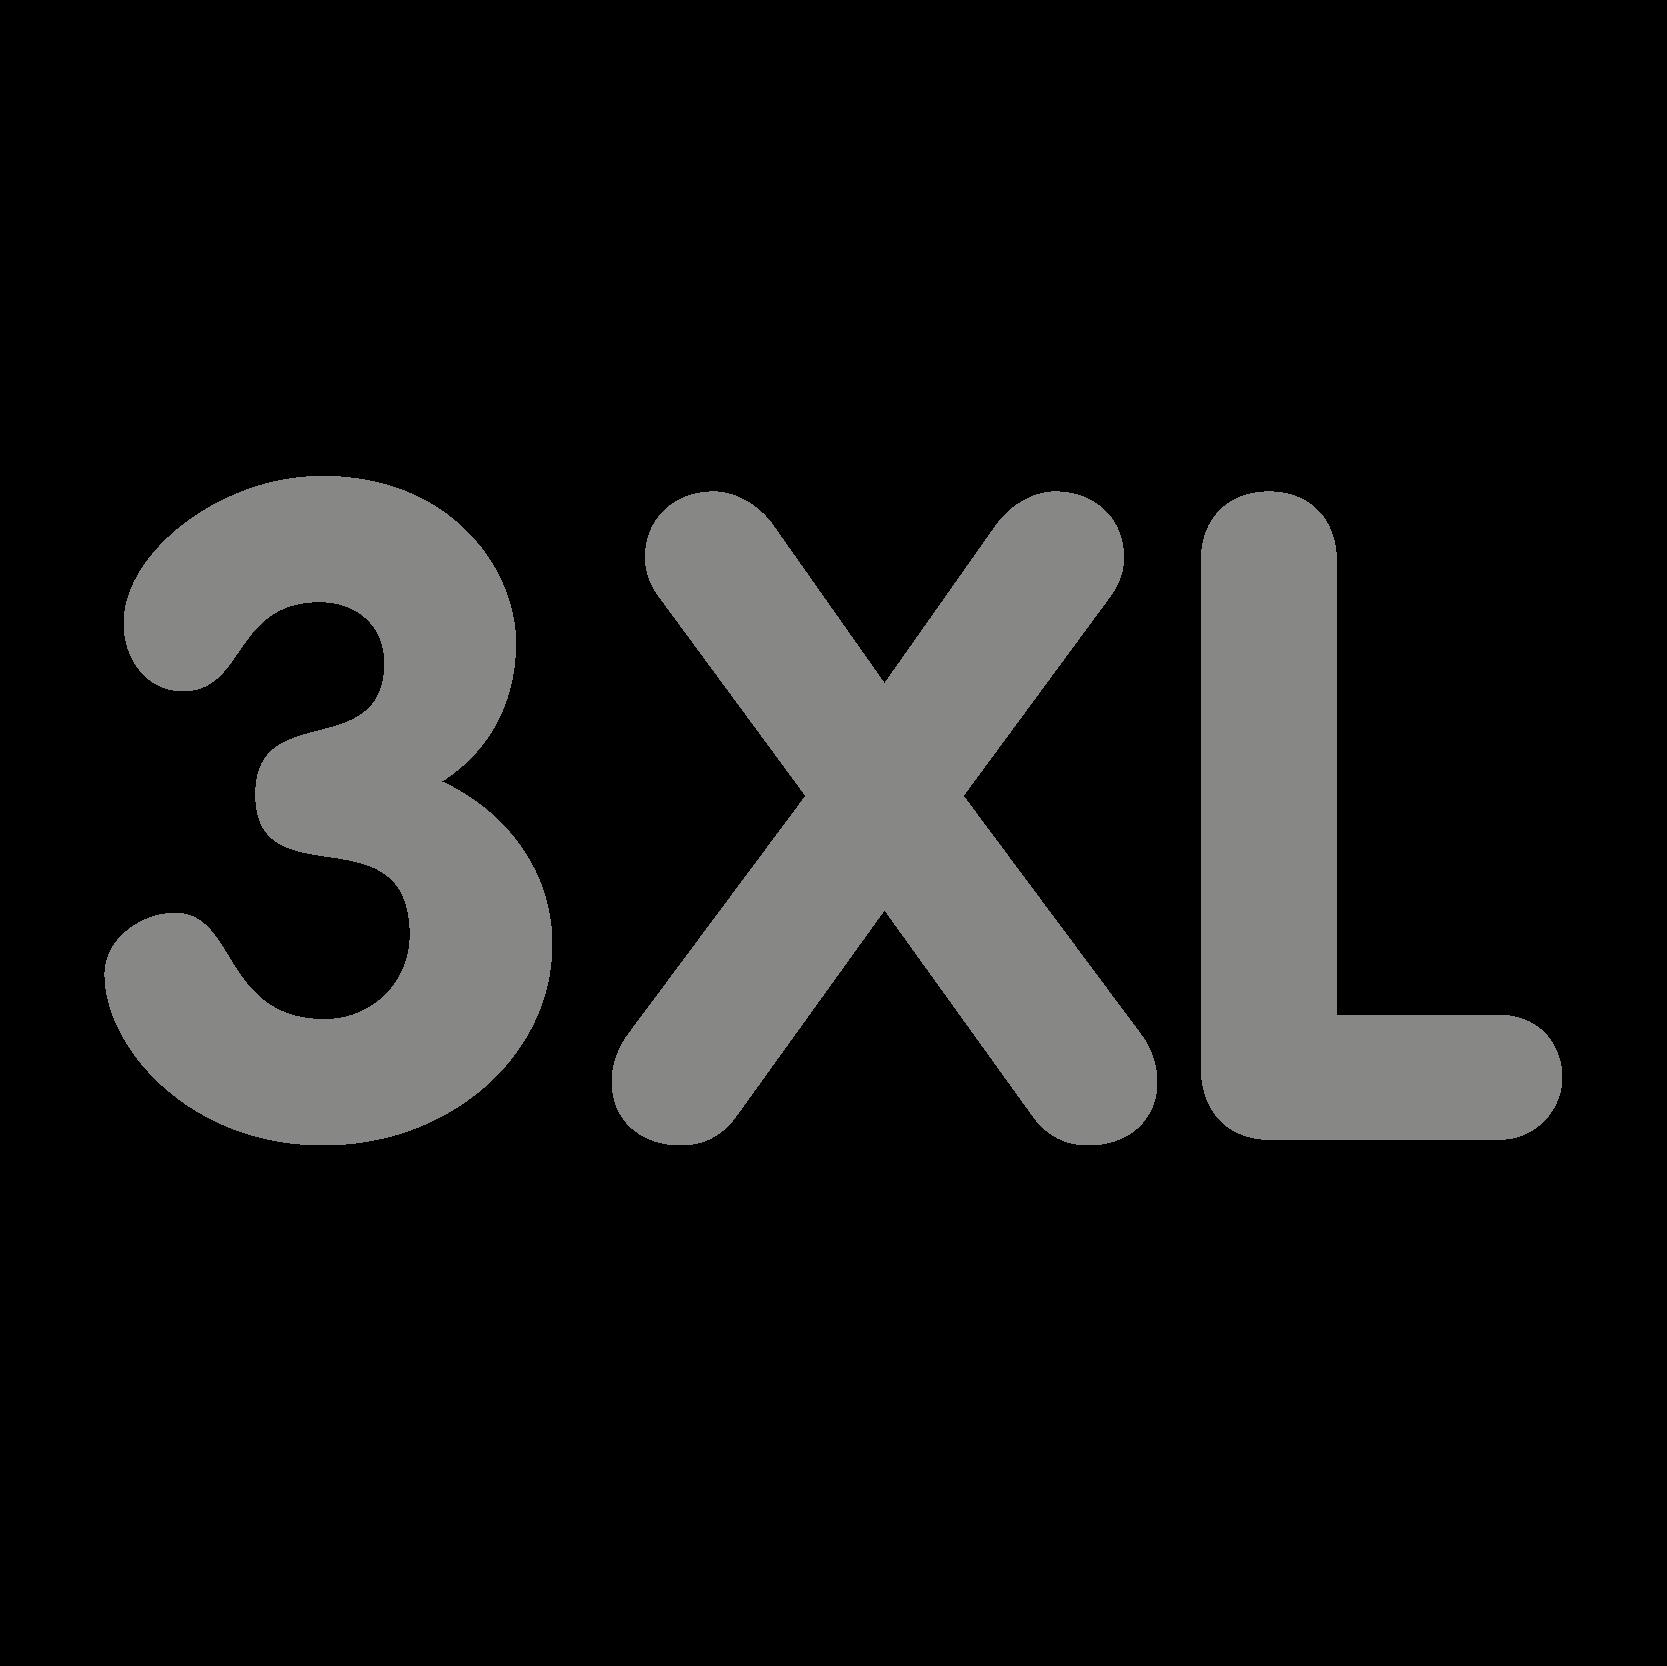 iconModel_4_CQ6421